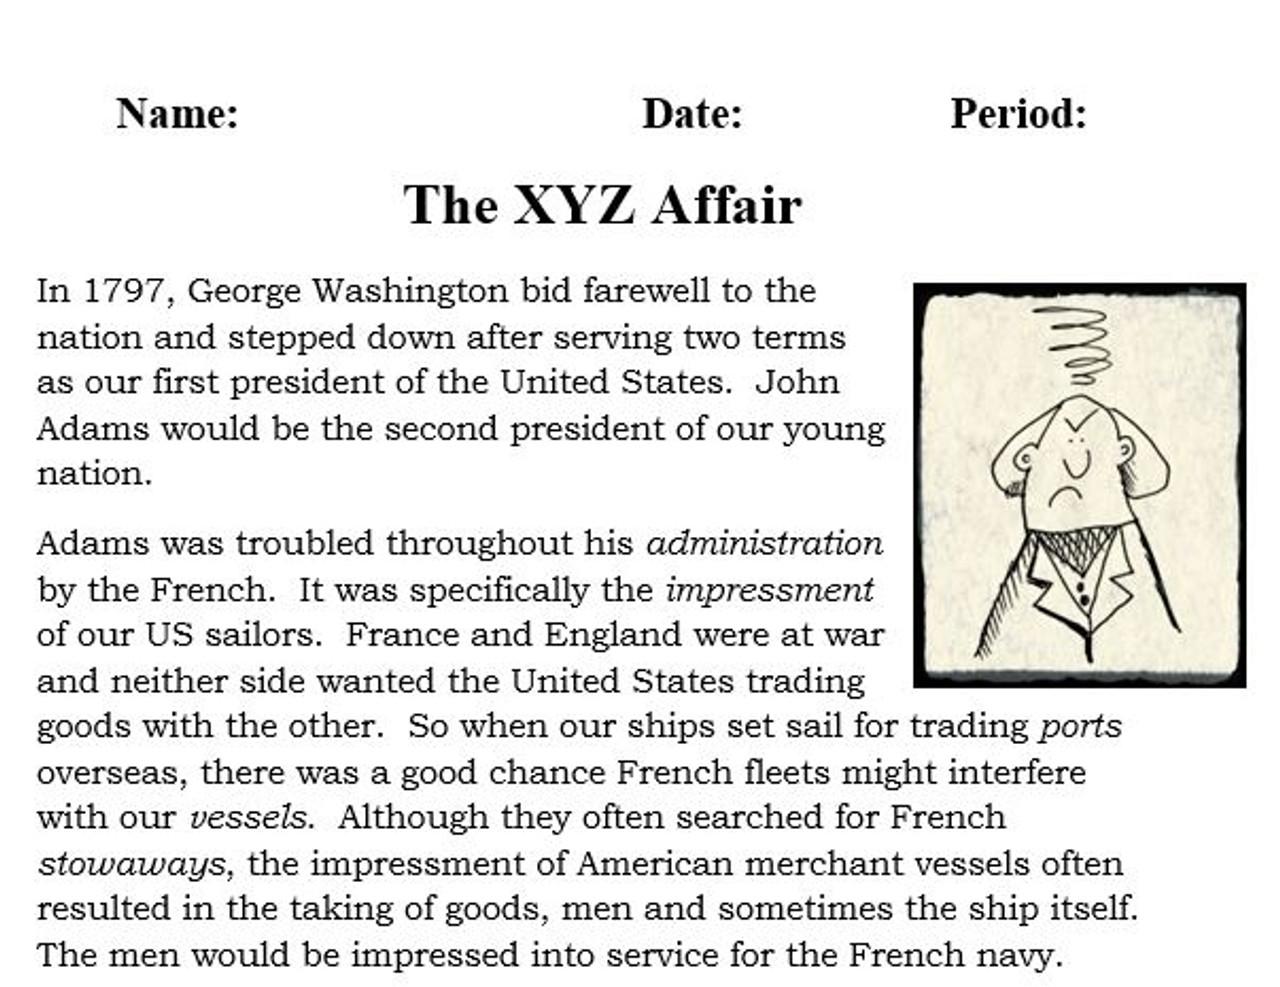 XYZ Affair - (TRTW) - Talk, Read, Talk, Write